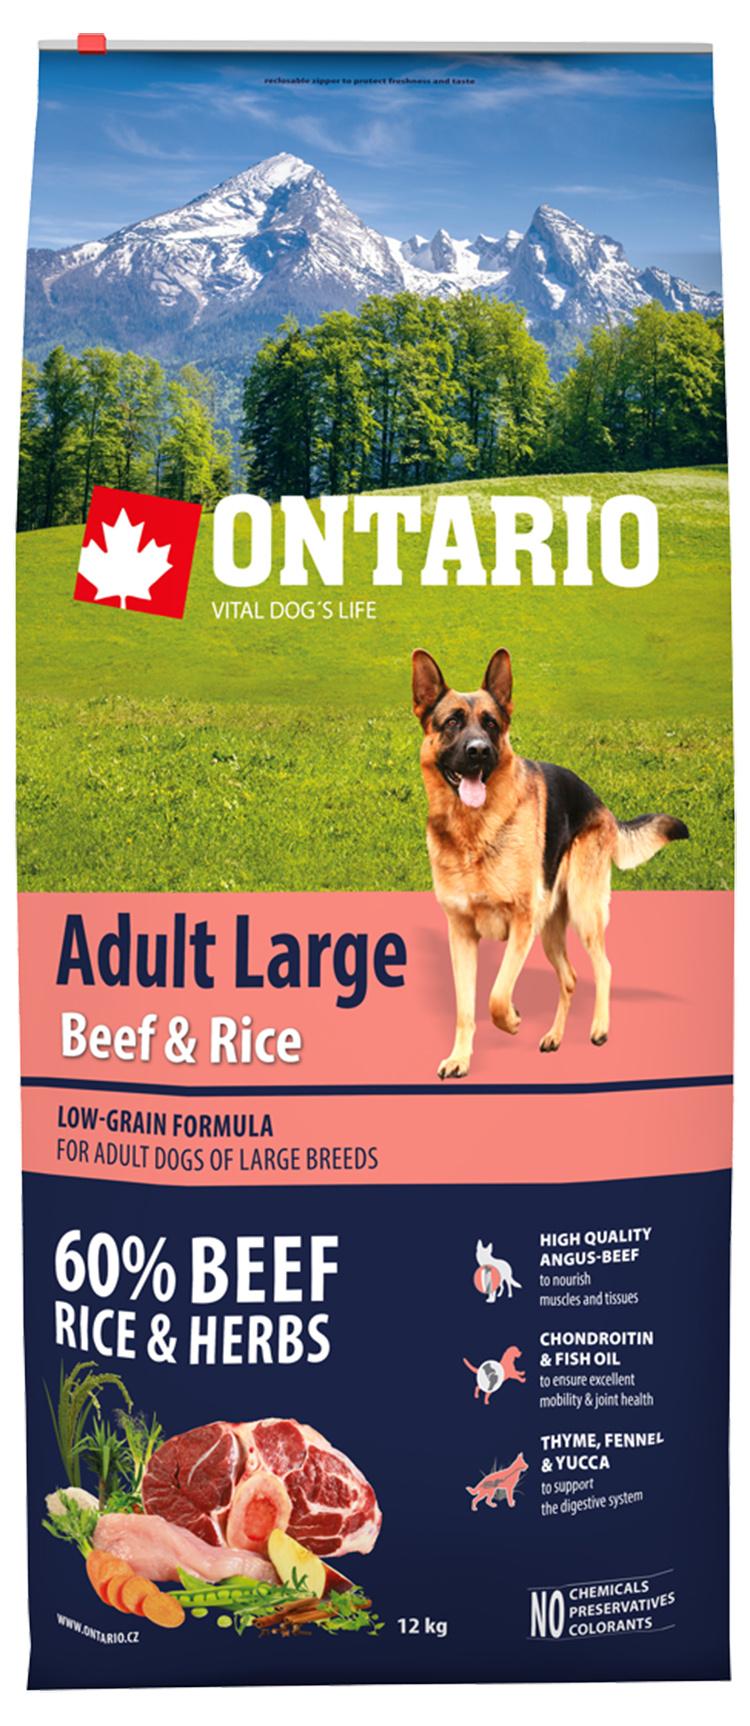 Корм для крупных собак - ONTARIO Adult Large Beef & Rice, 12 кг